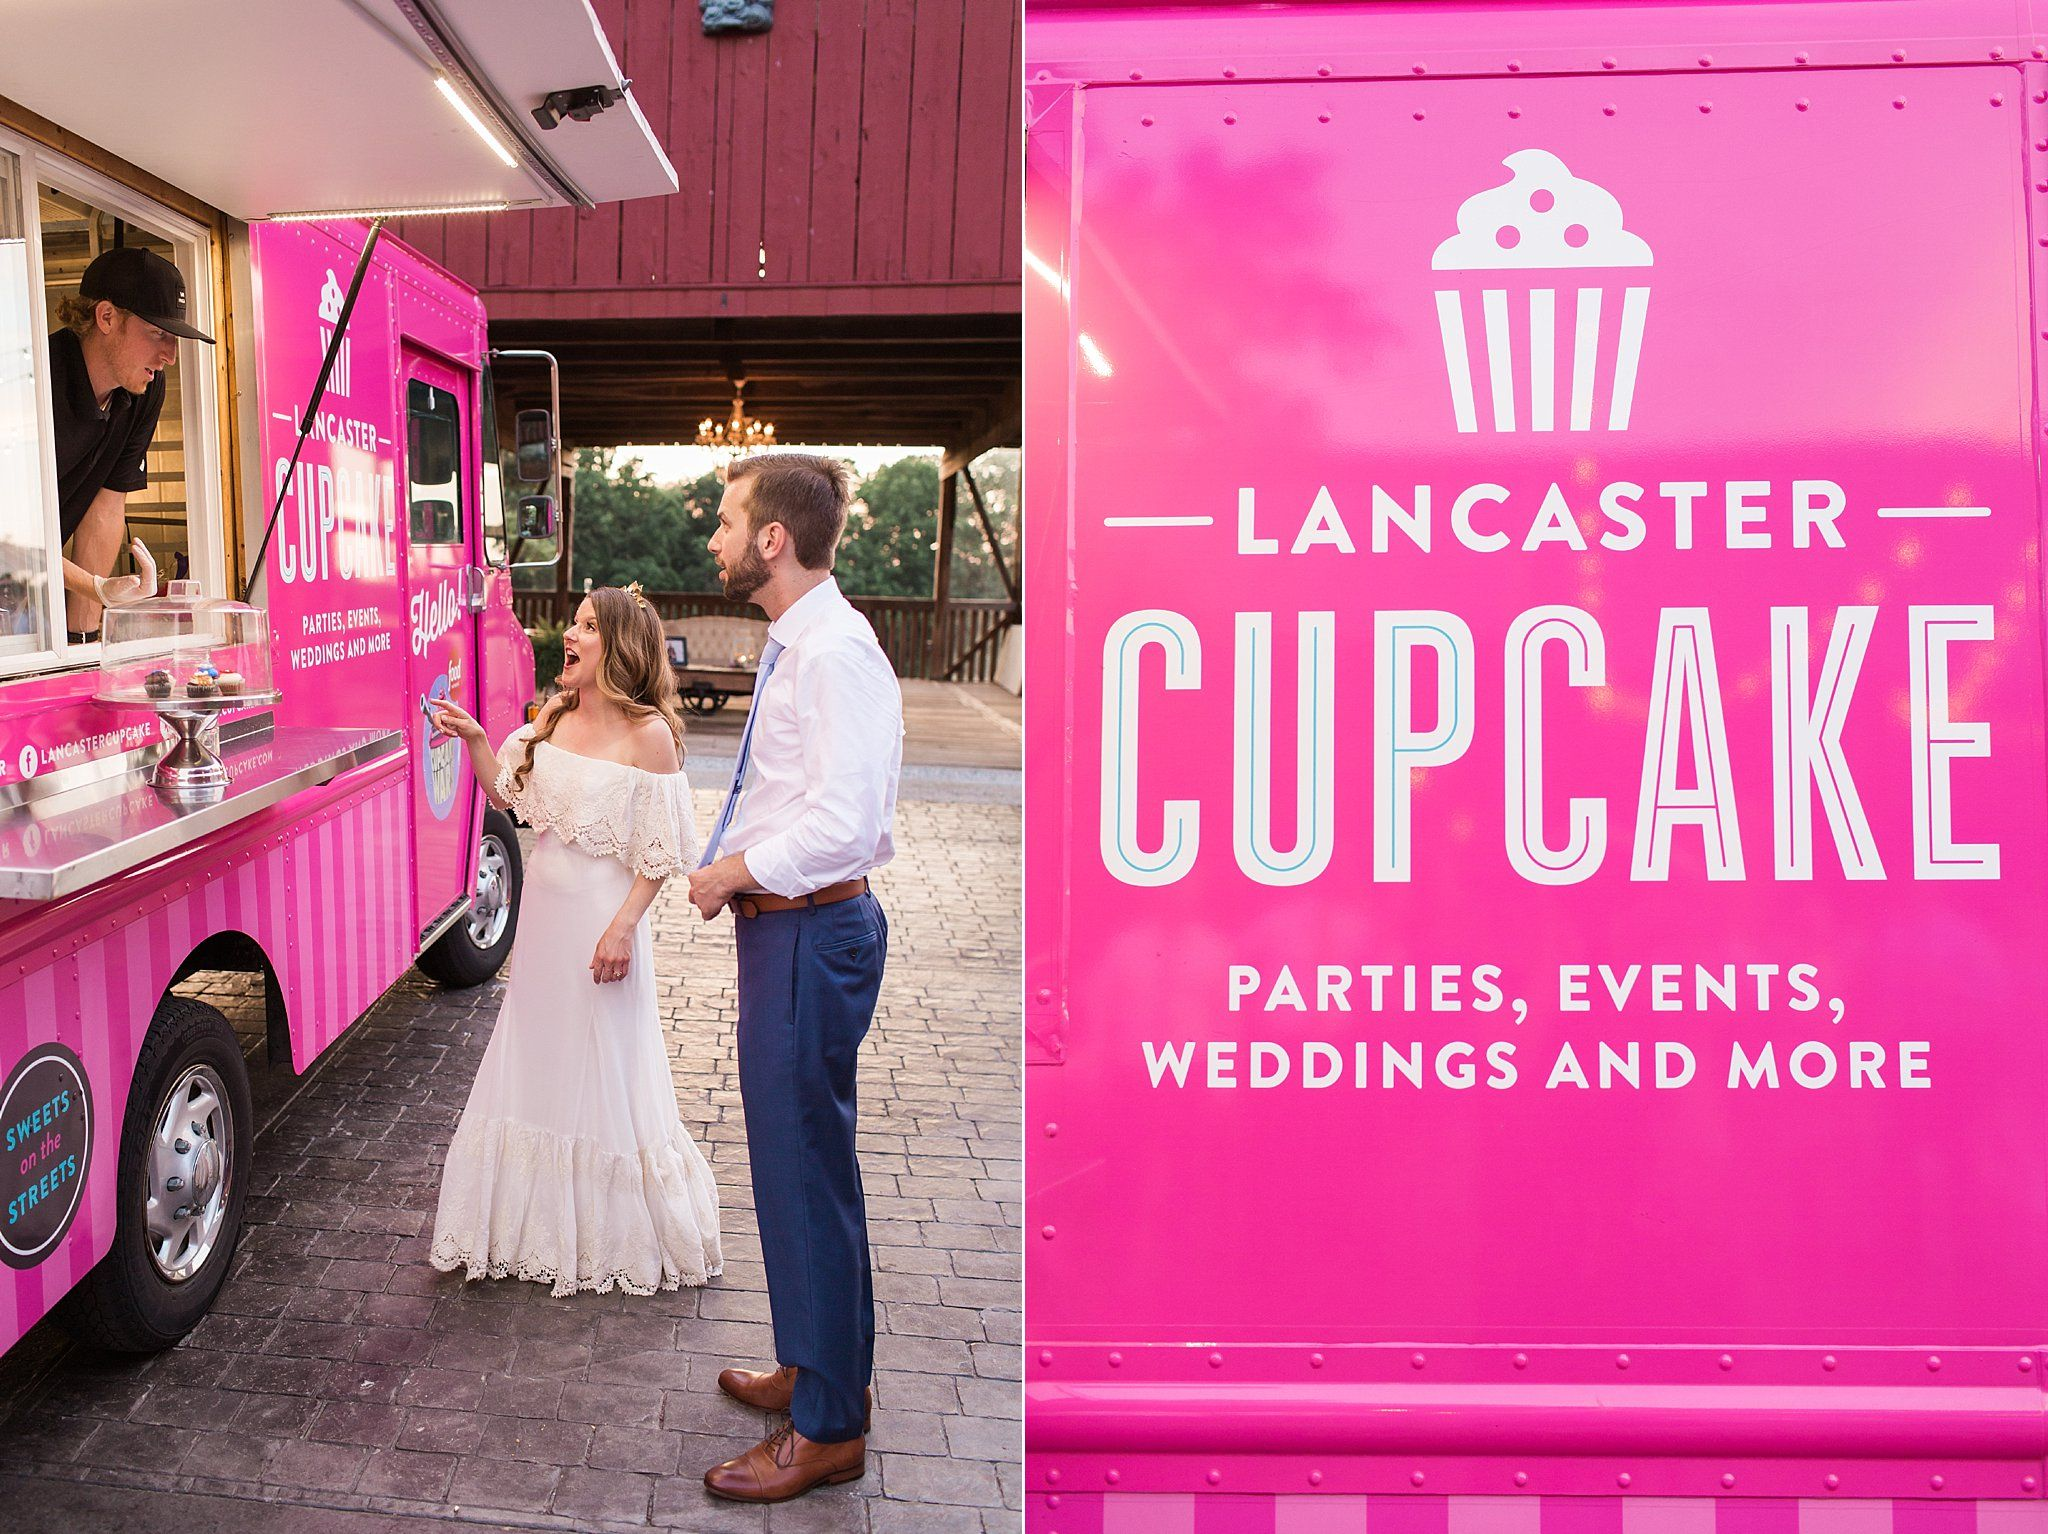 lancaster cupcake food truck wedding favor | Samantha Jay ...